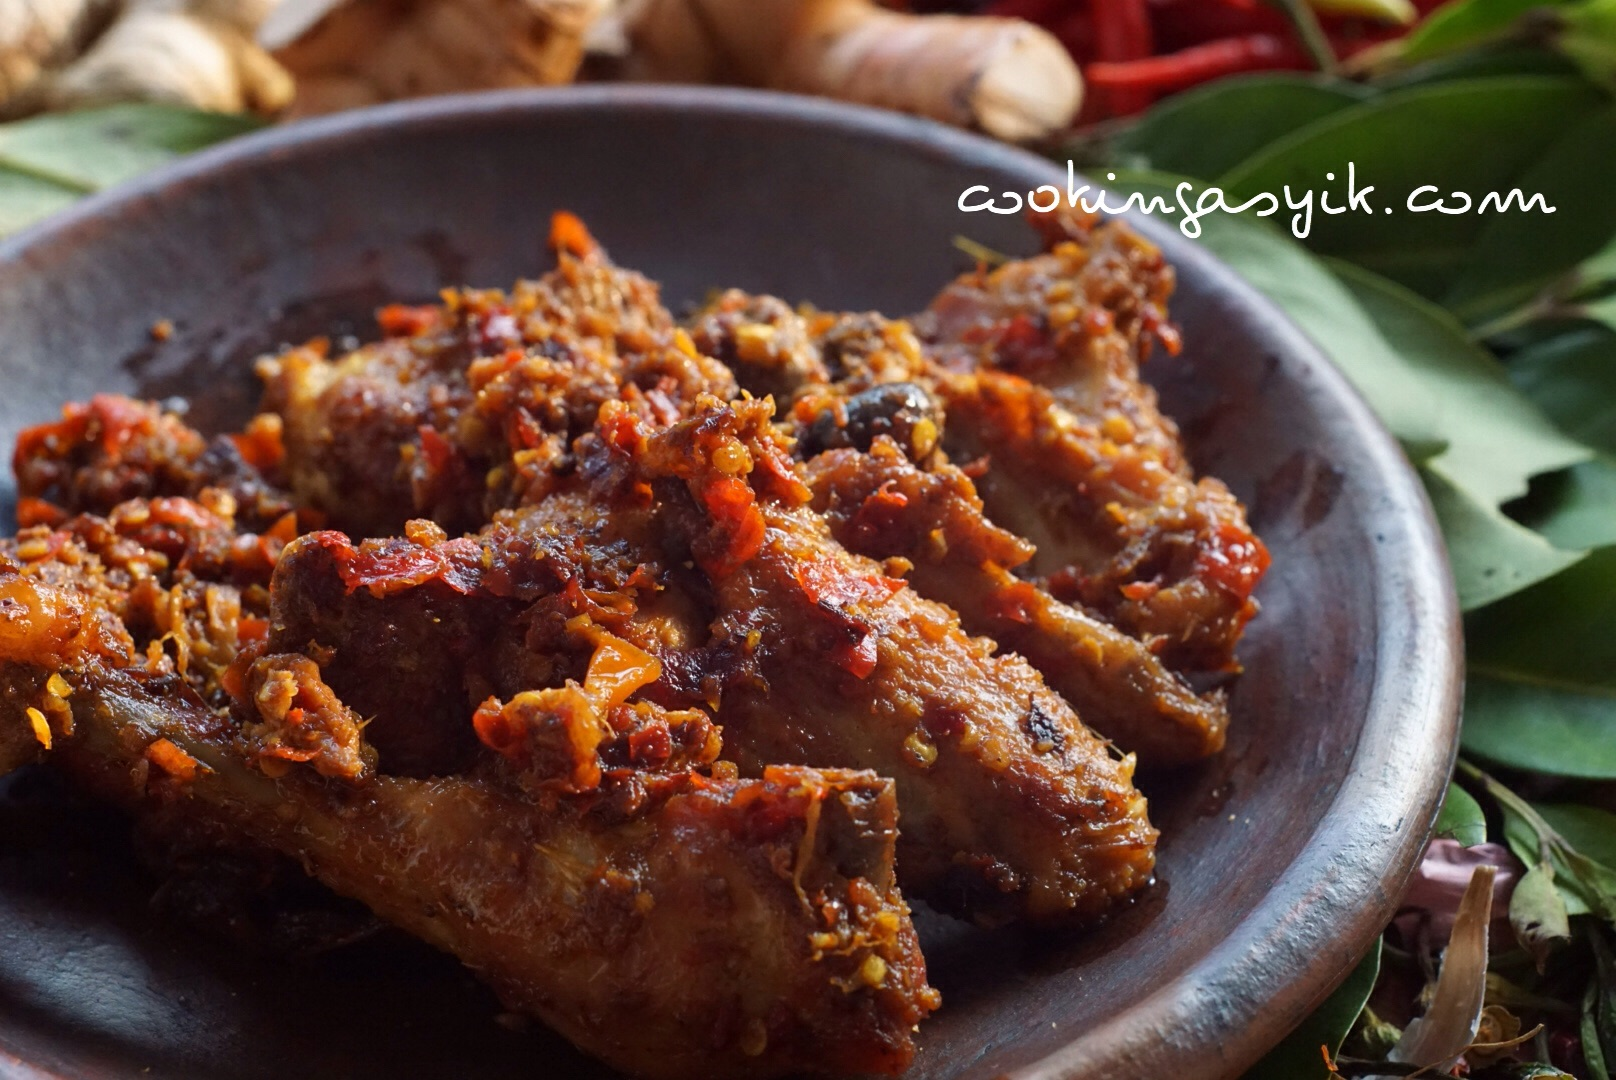 Ayam Goreng Pedas ala Madura, hati-hati ketagihan! - Cooking Asyik